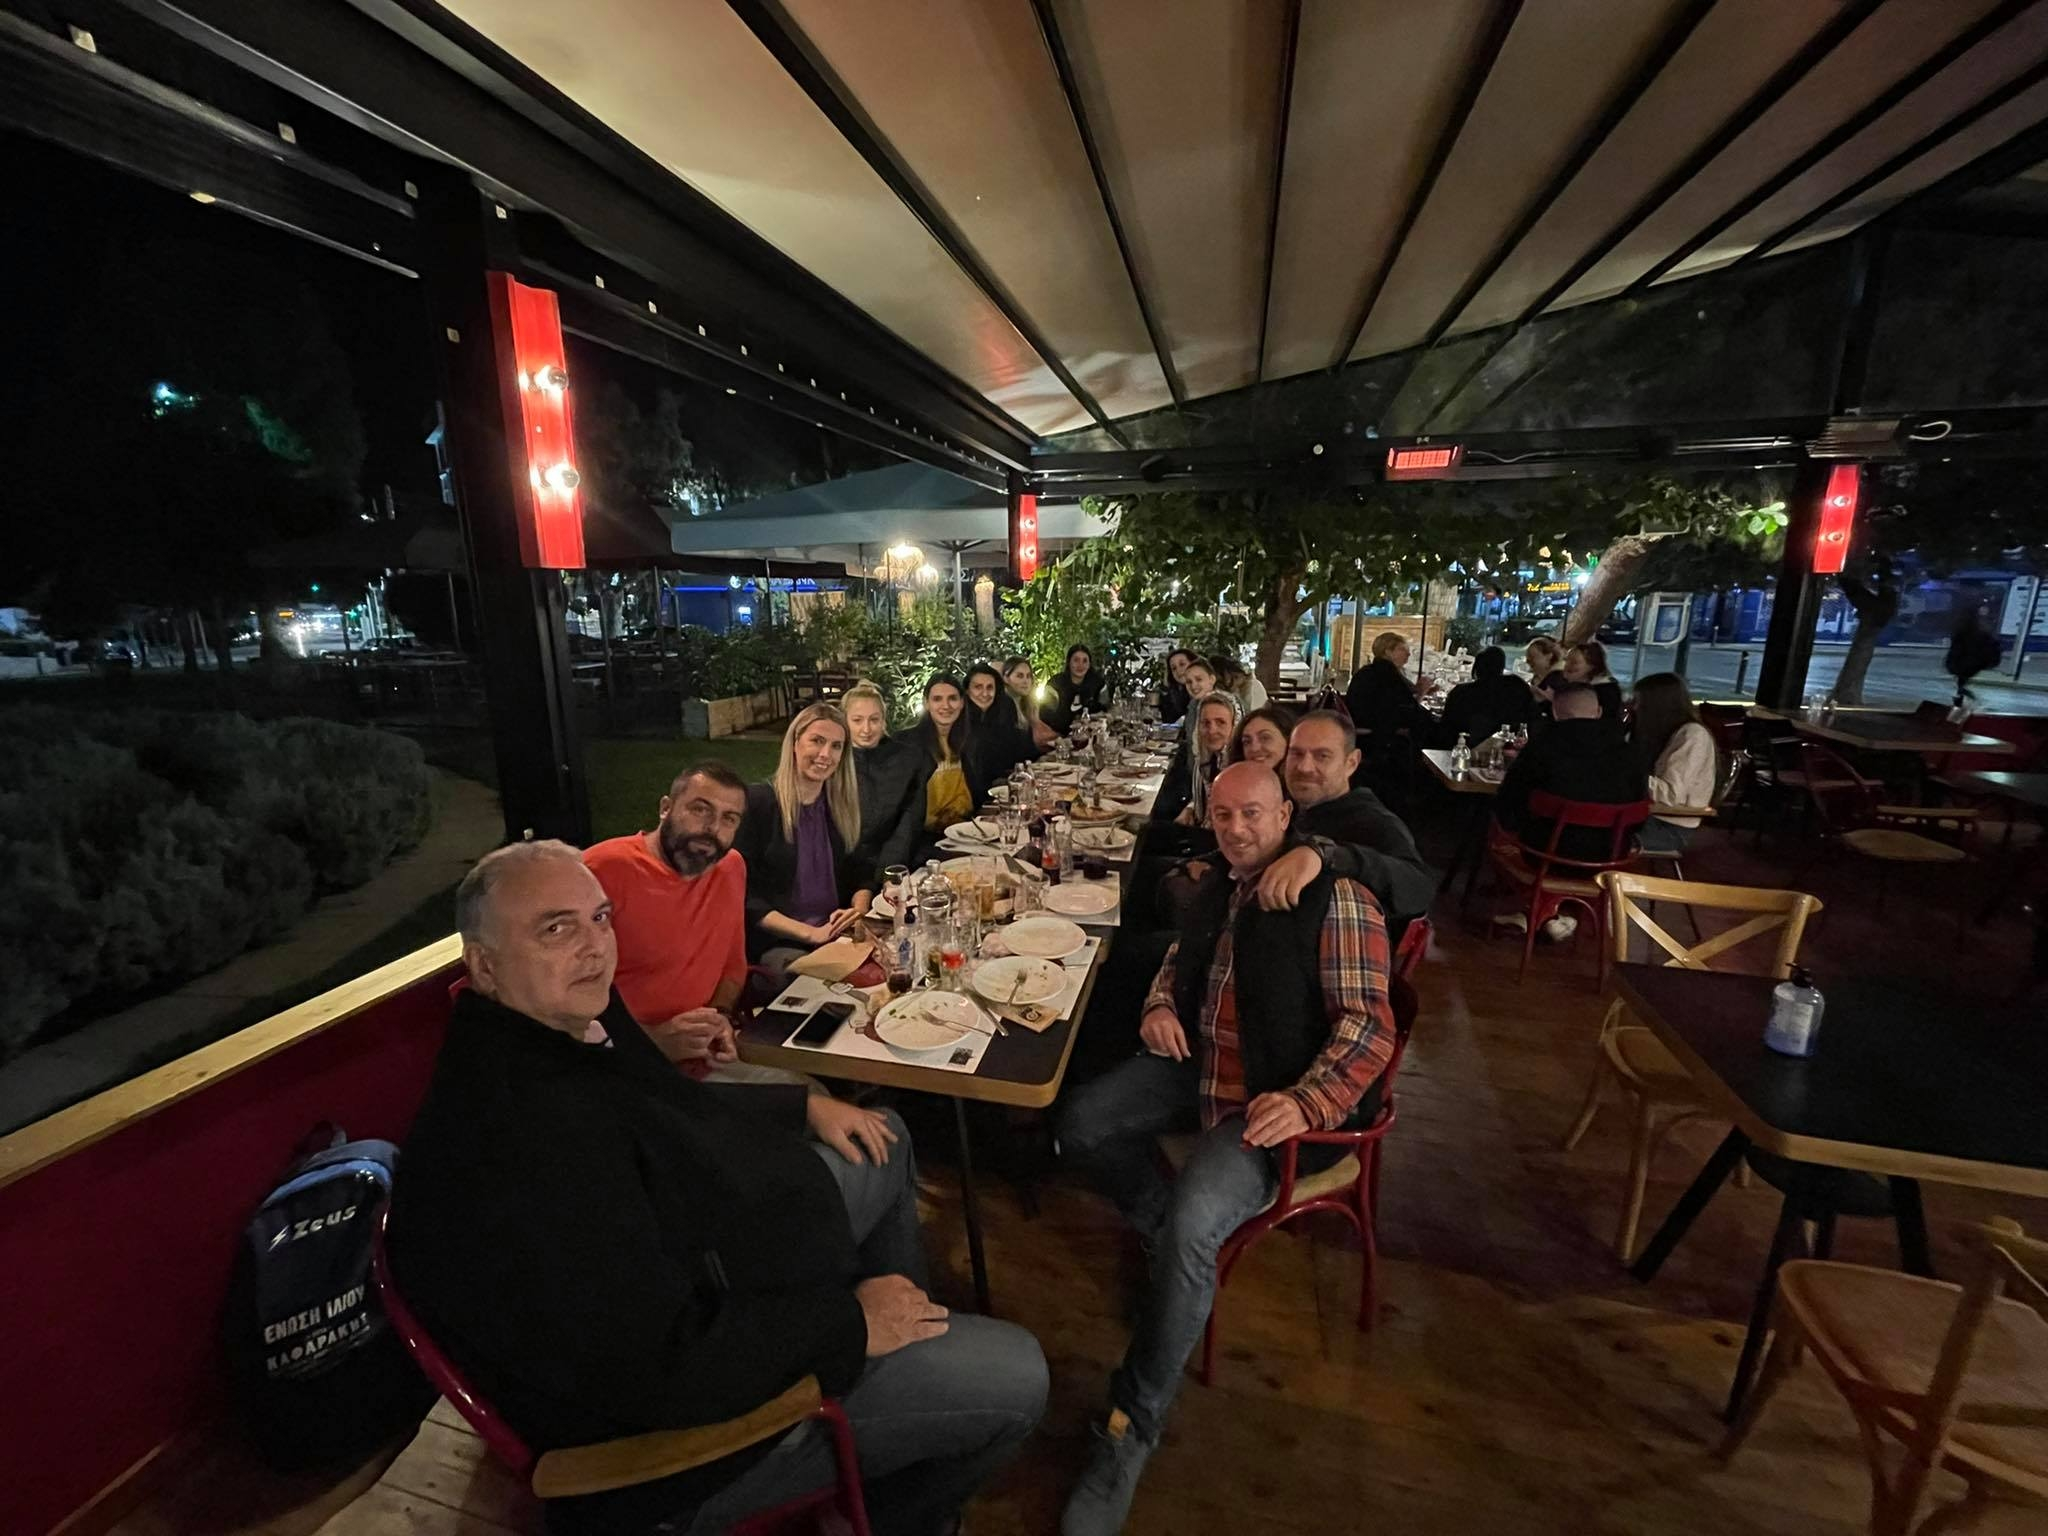 IΔείπνο για καλή σεζόν στις Γυναίκες της Ένωσης Ιλίου από το Enzzo Cook Bar!